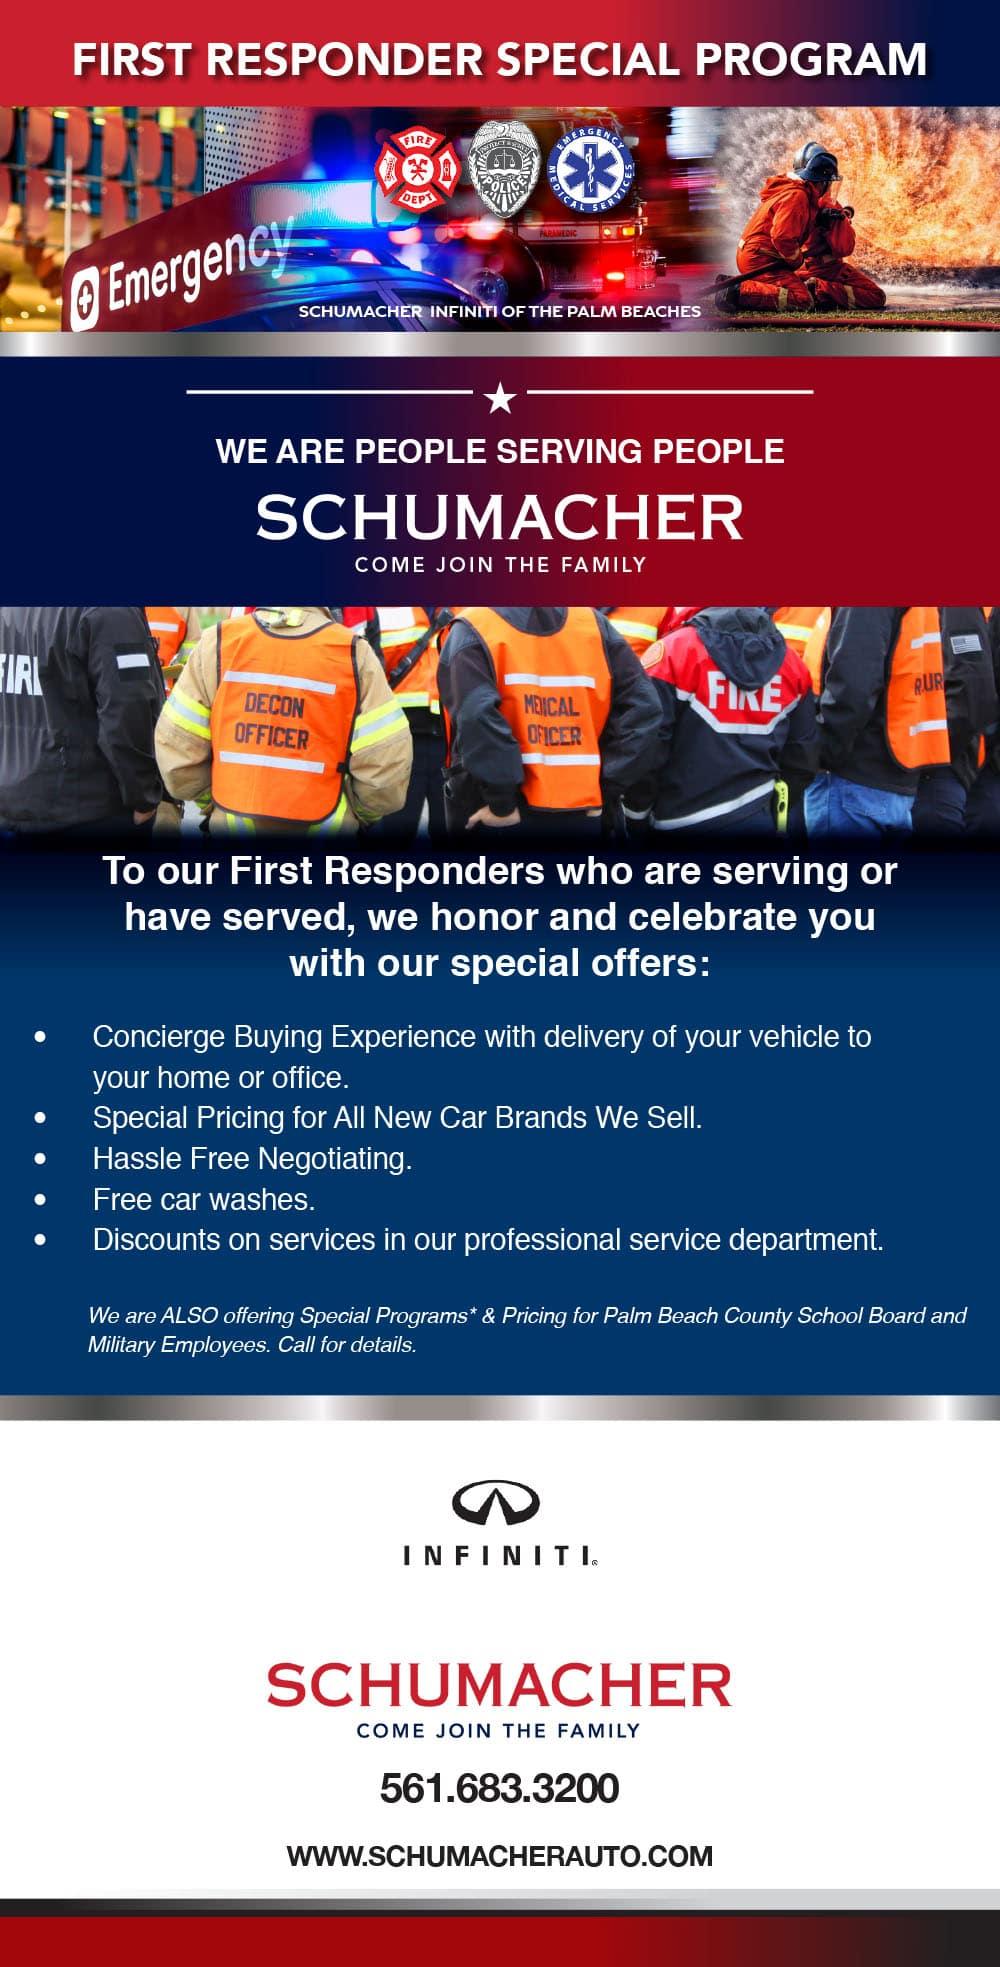 First Responder Program | INFINITI of the Palm Beaches